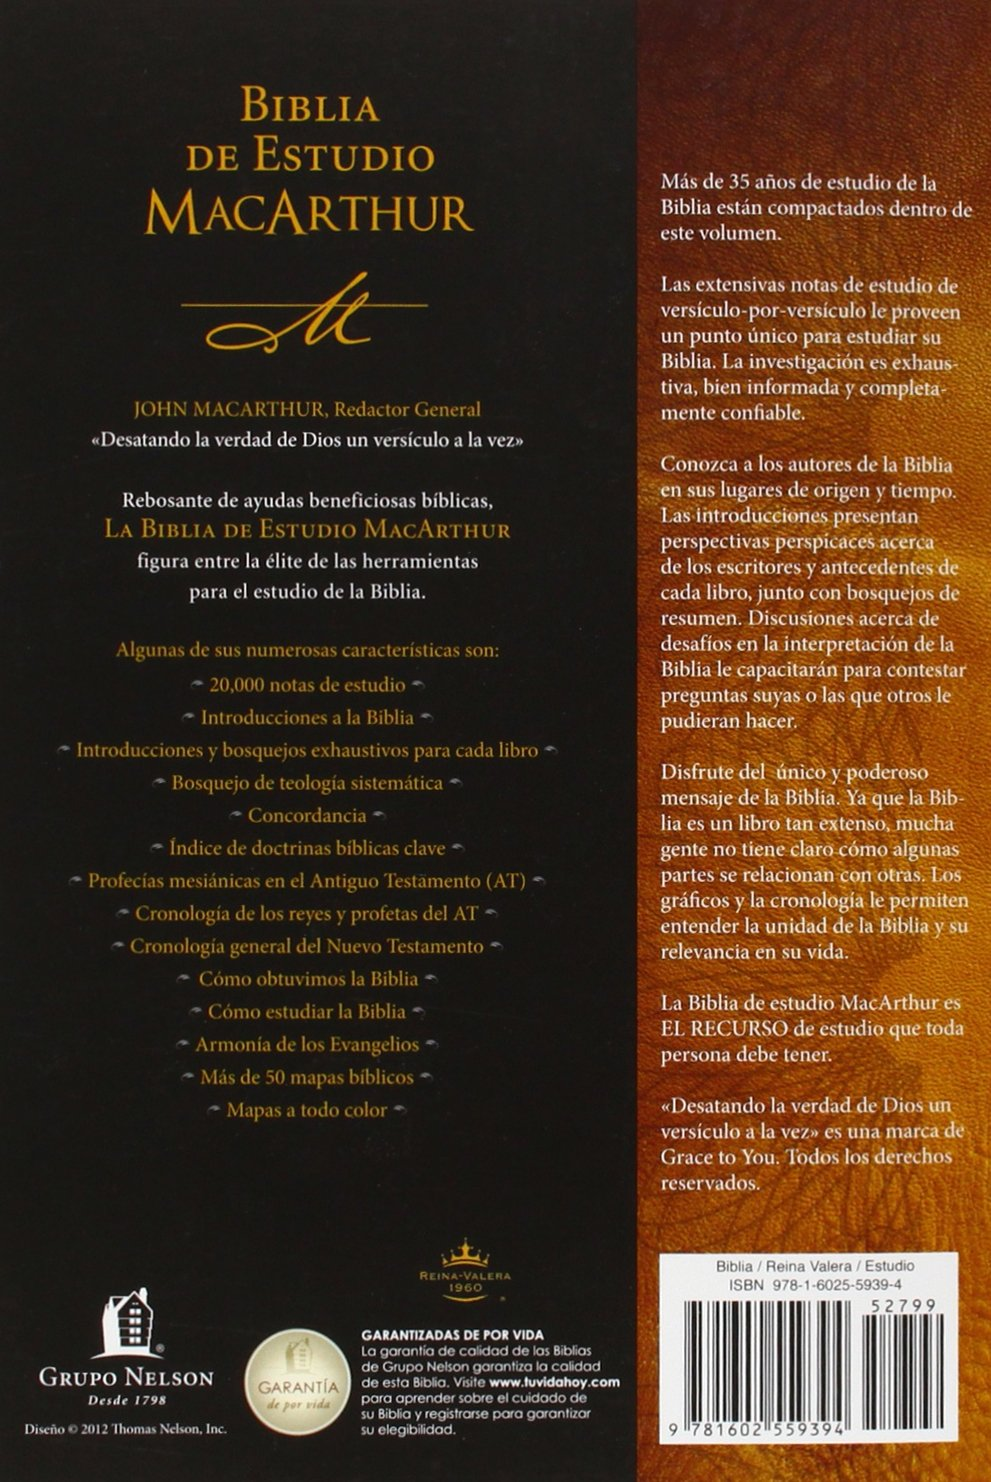 Biblia de estudio MacArthur (Spanish Edition): John F. MacArthur:  9781602559394: Amazon.com: Books